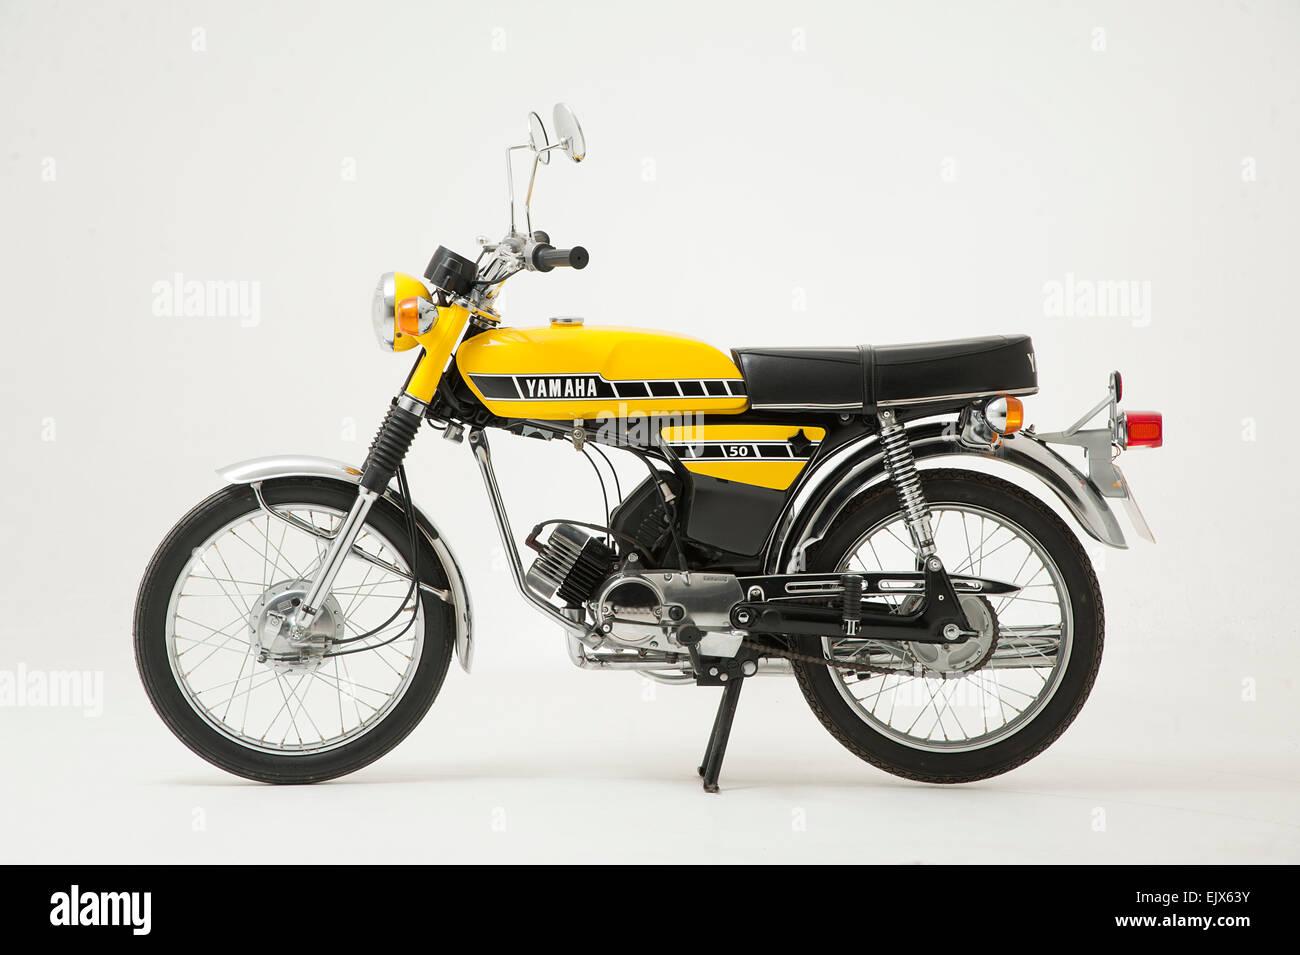 1987 Yamaha FS1E moped - Stock Image